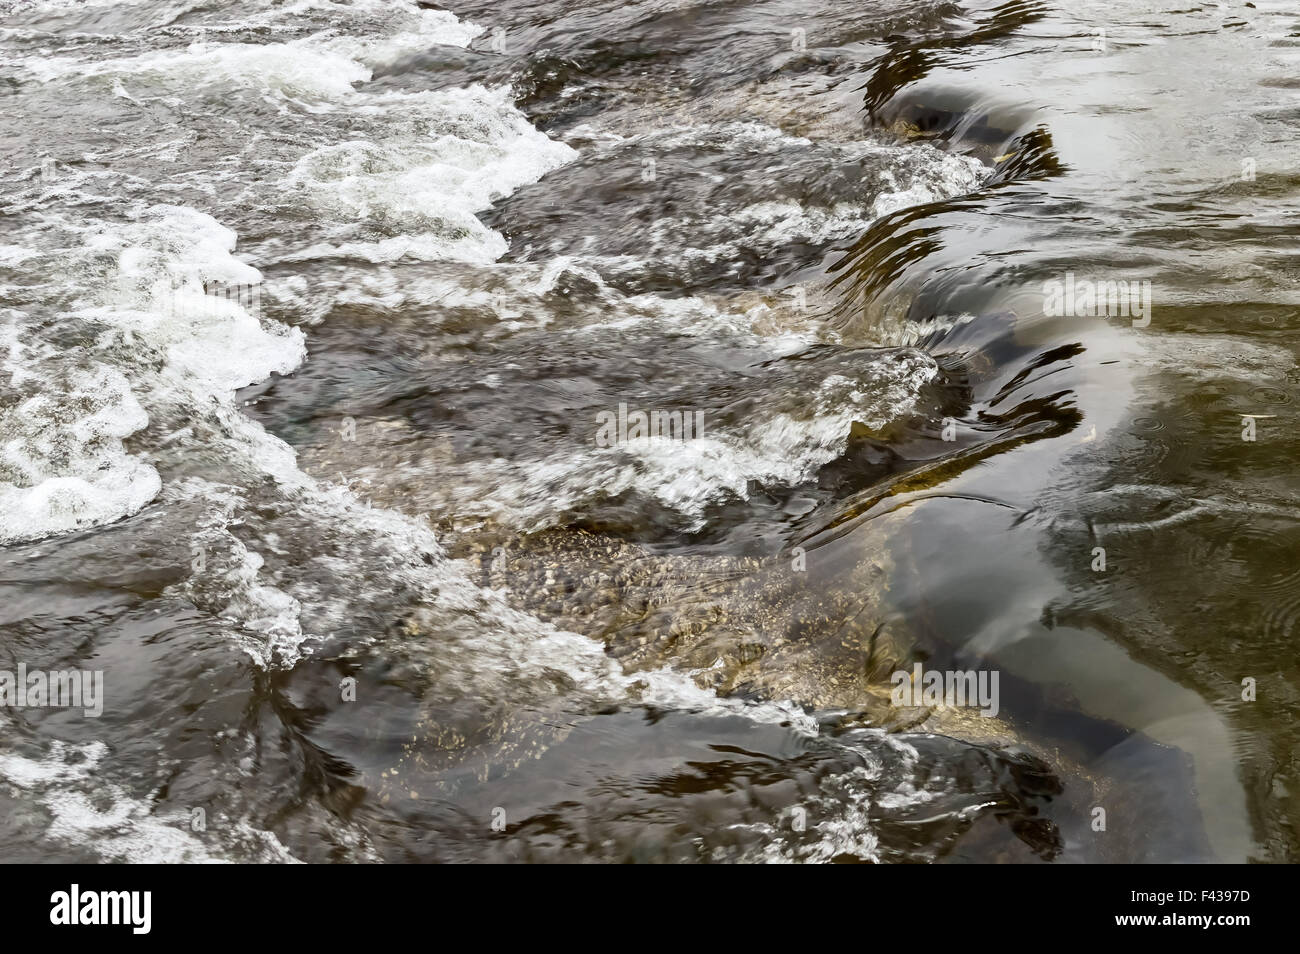 Rapids on a stream Stock Photo